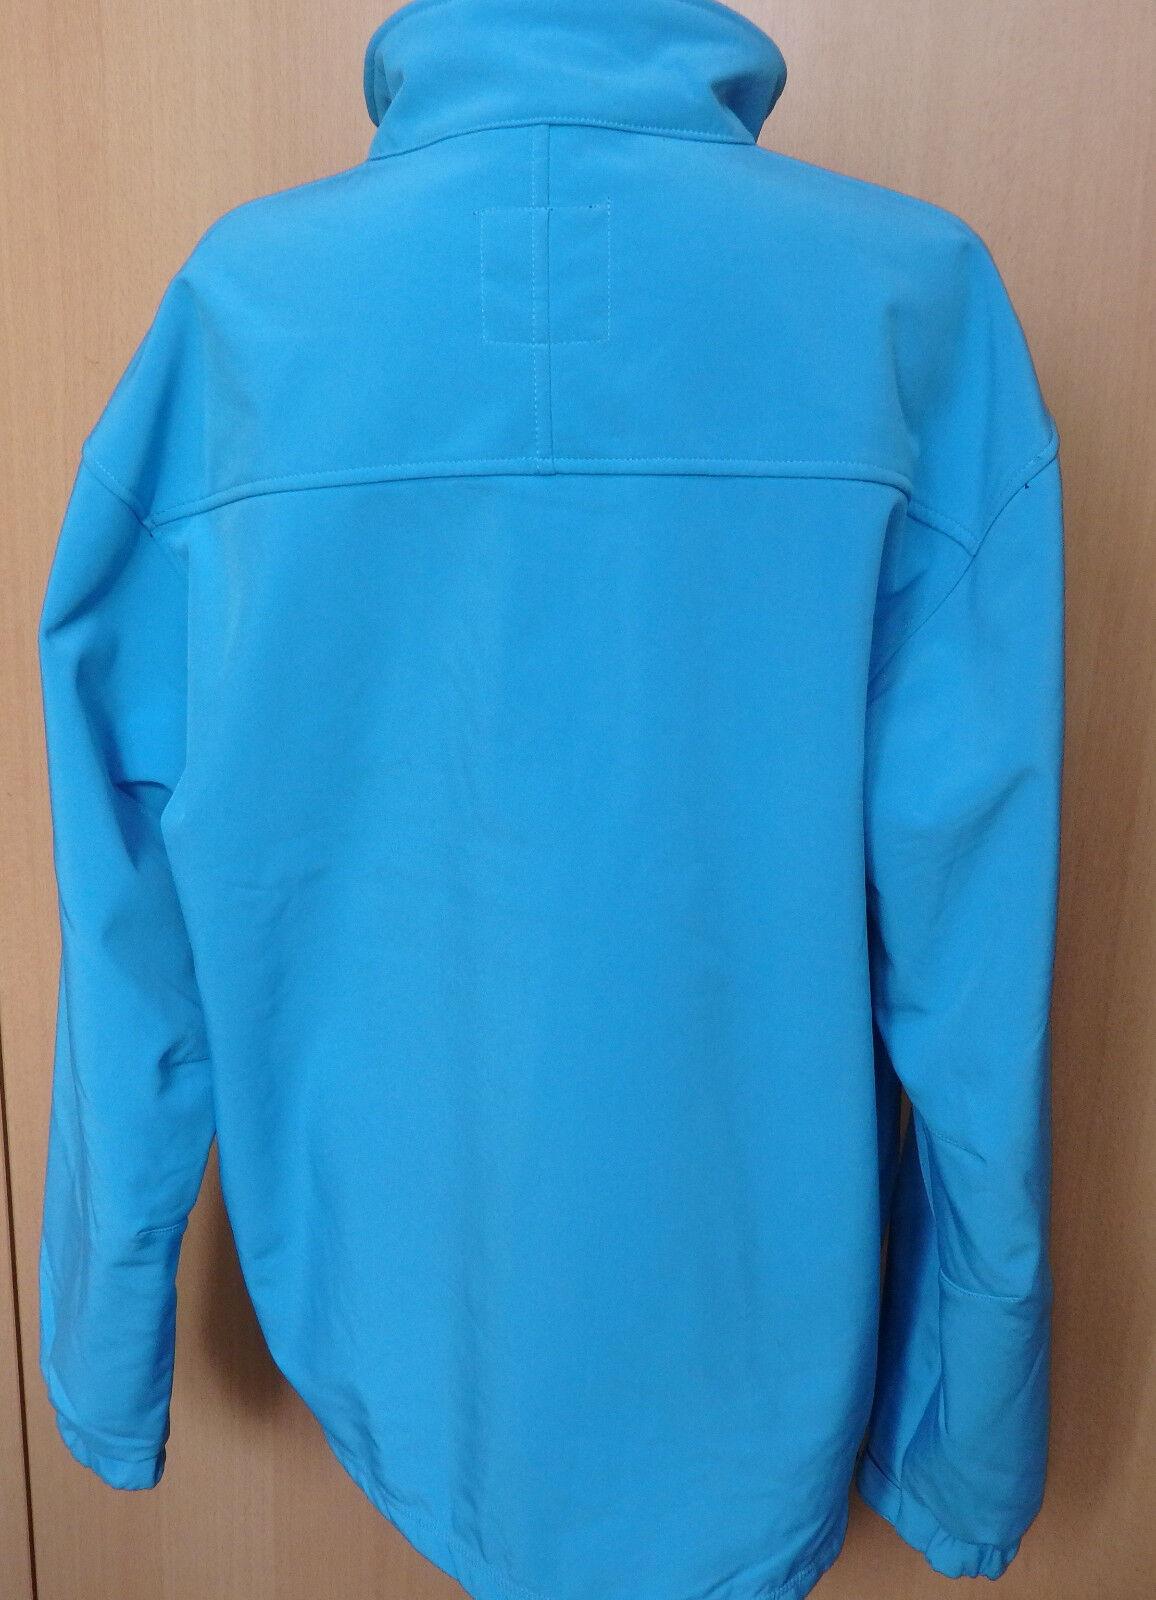 Ocean señores Softshell chaqueta, azul, talla talla talla XXL 384b4b